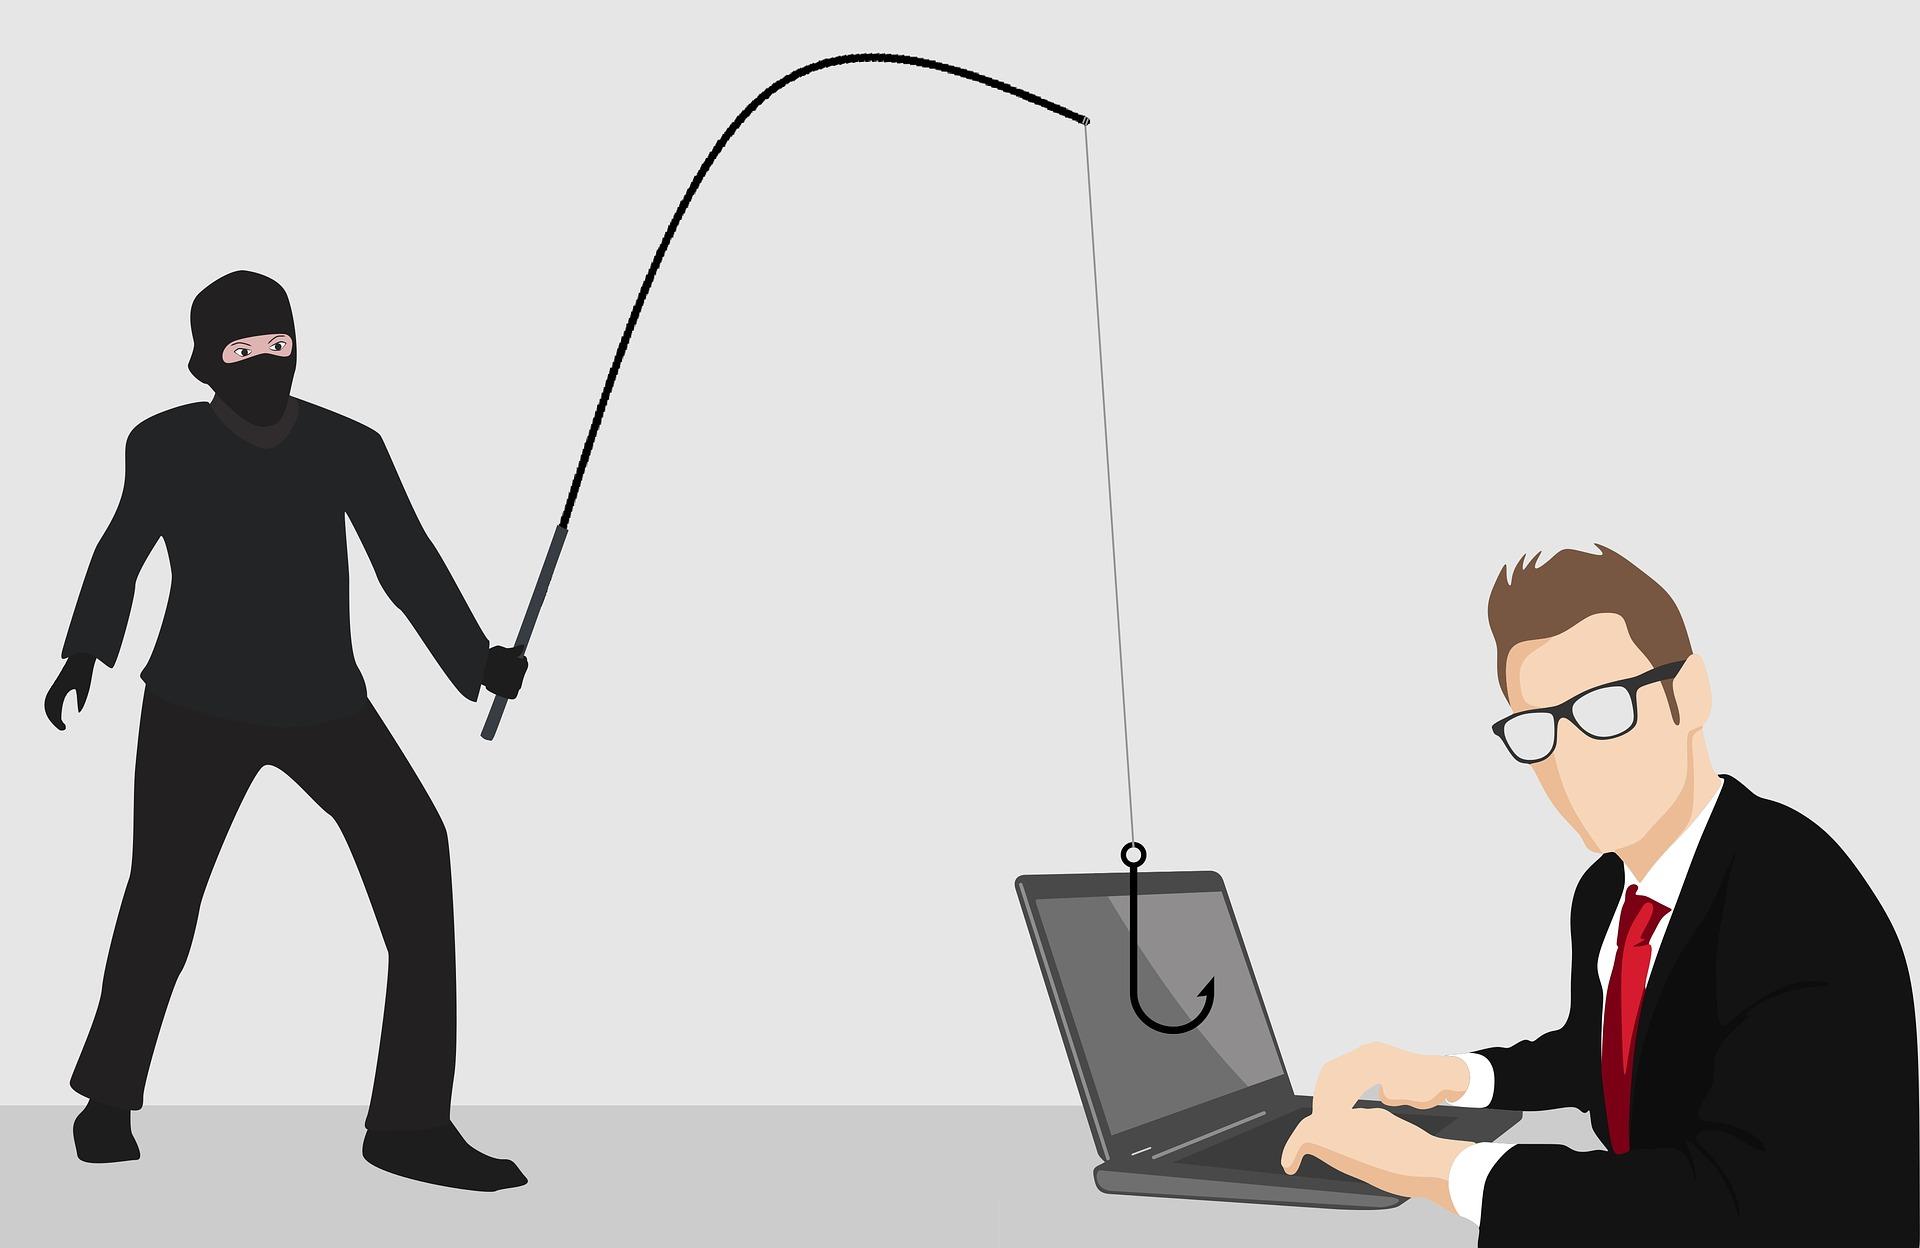 """Scotiabank Online Security Alert for your Online Account"" Phishing Scam"